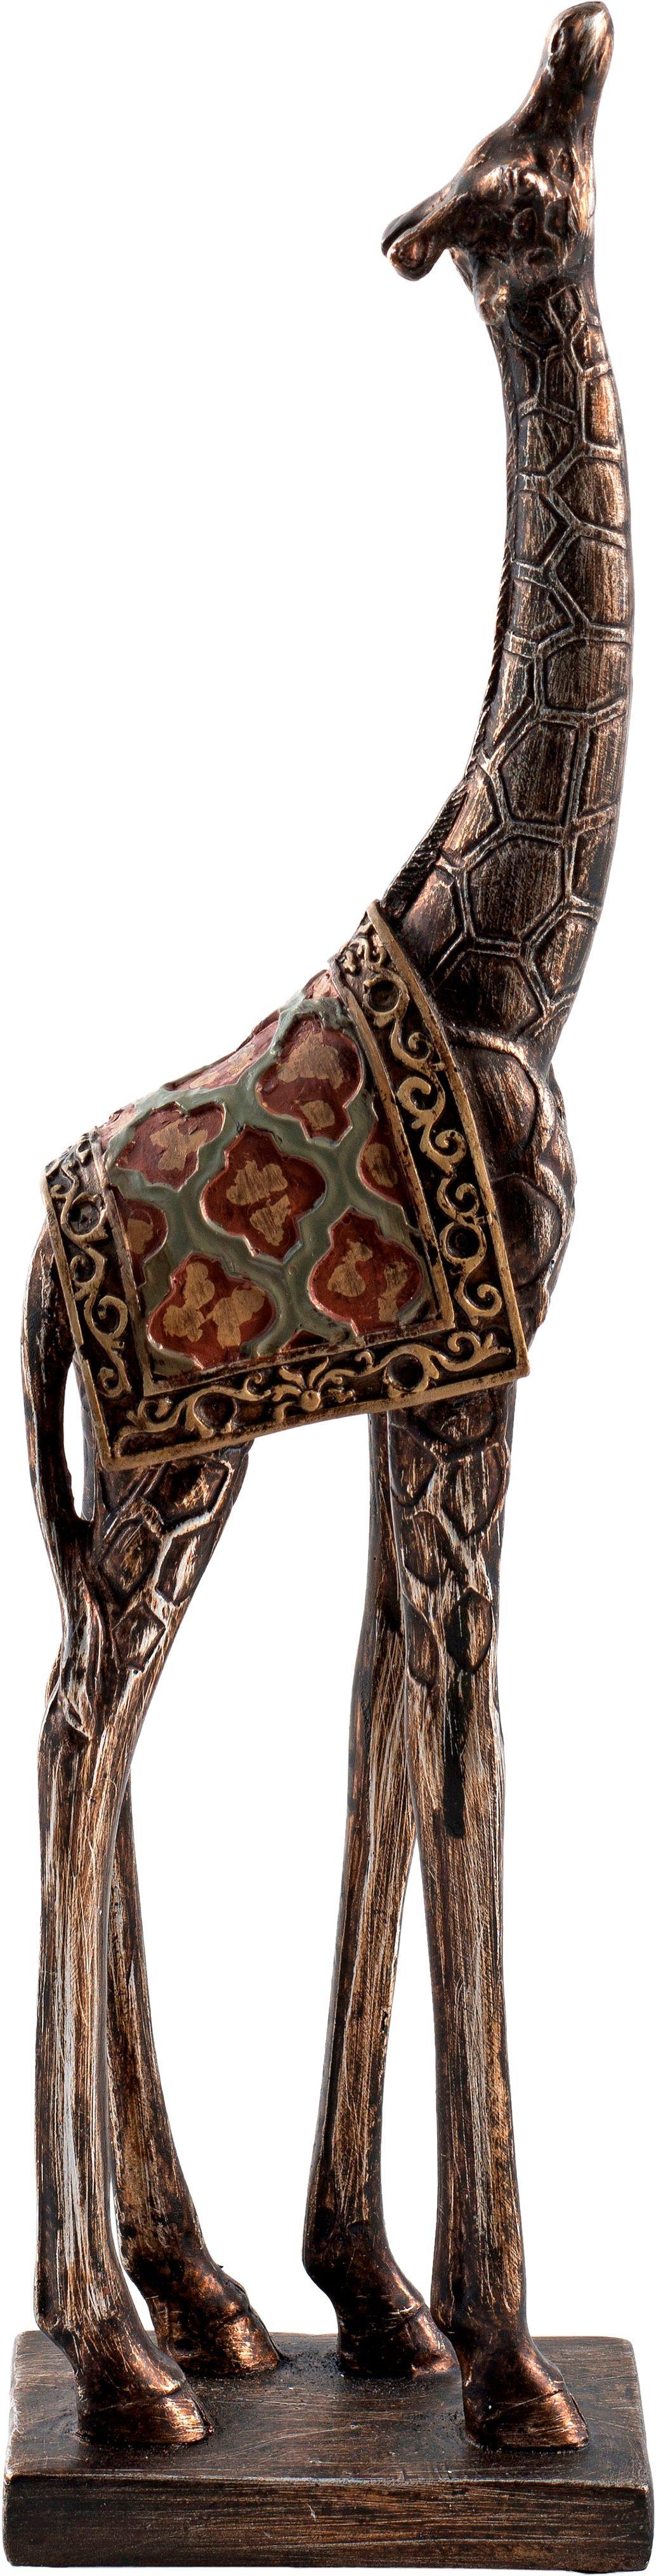 Home affaire Dekofigur Giraffe »Ole«